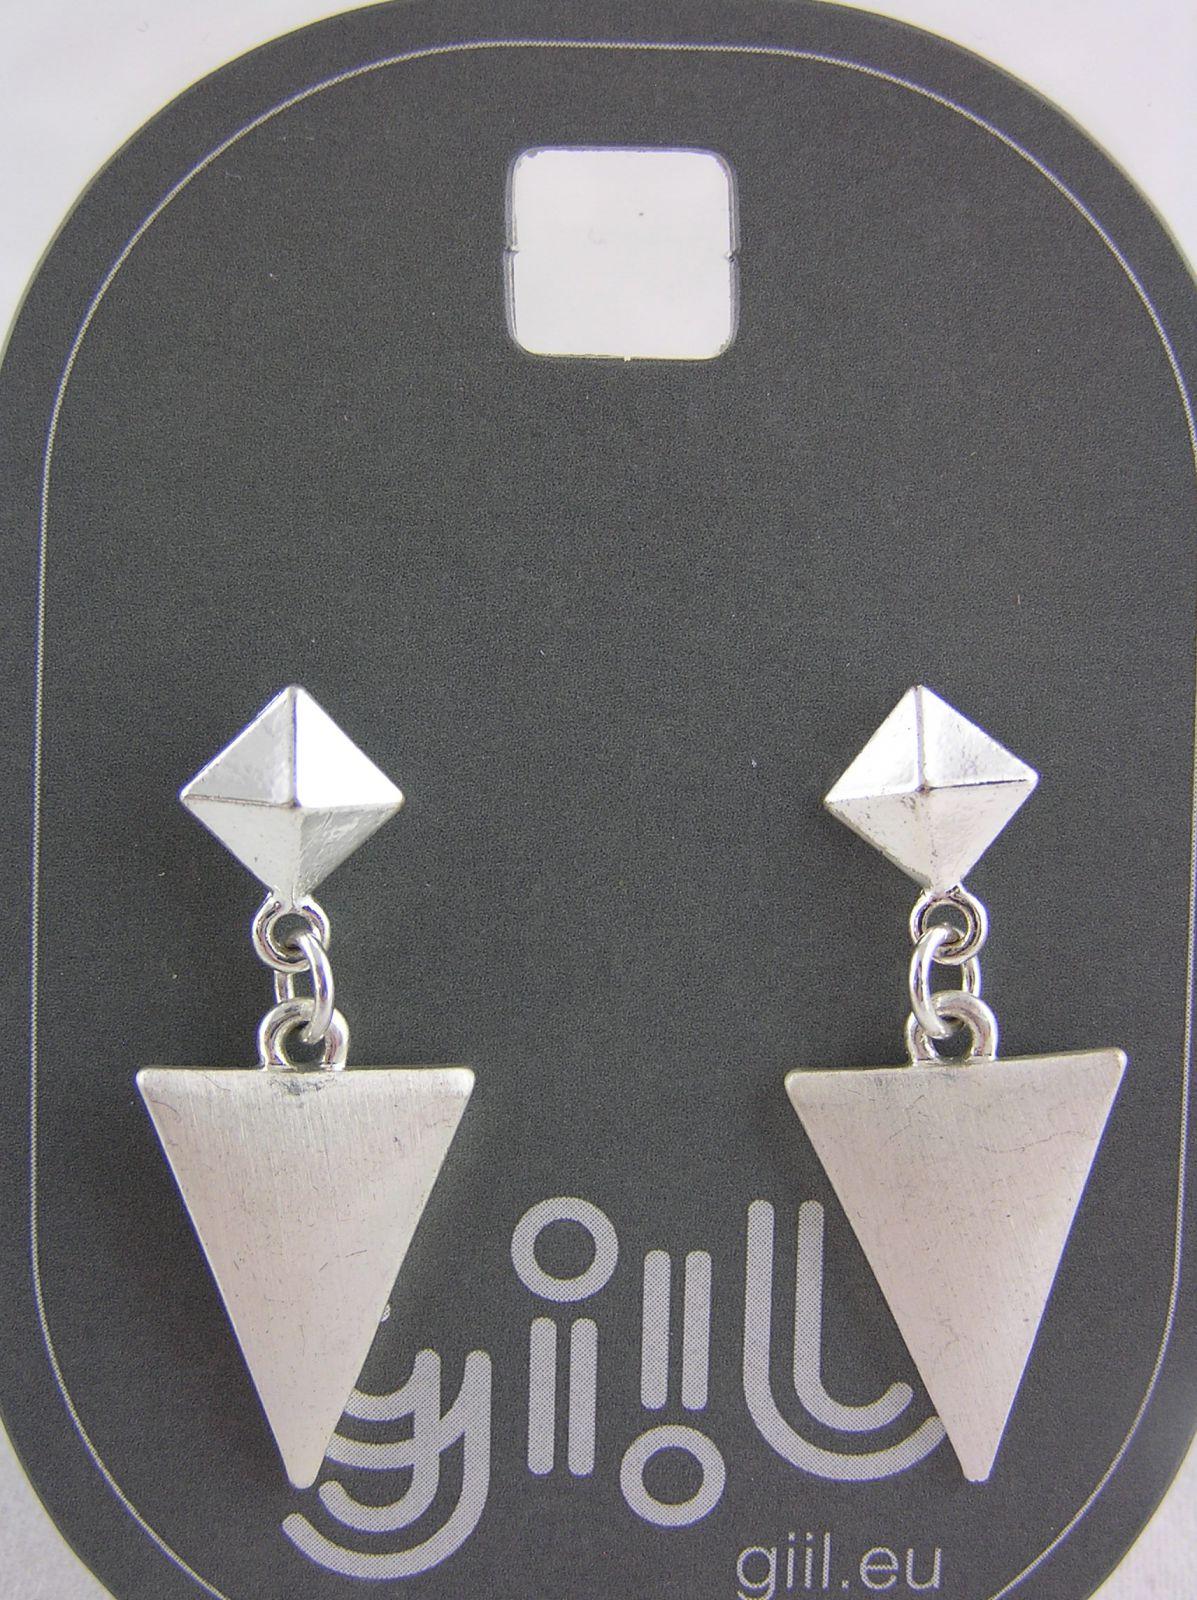 Stříbrné visací náušnice pyramida s trojúhelníkem GIIL